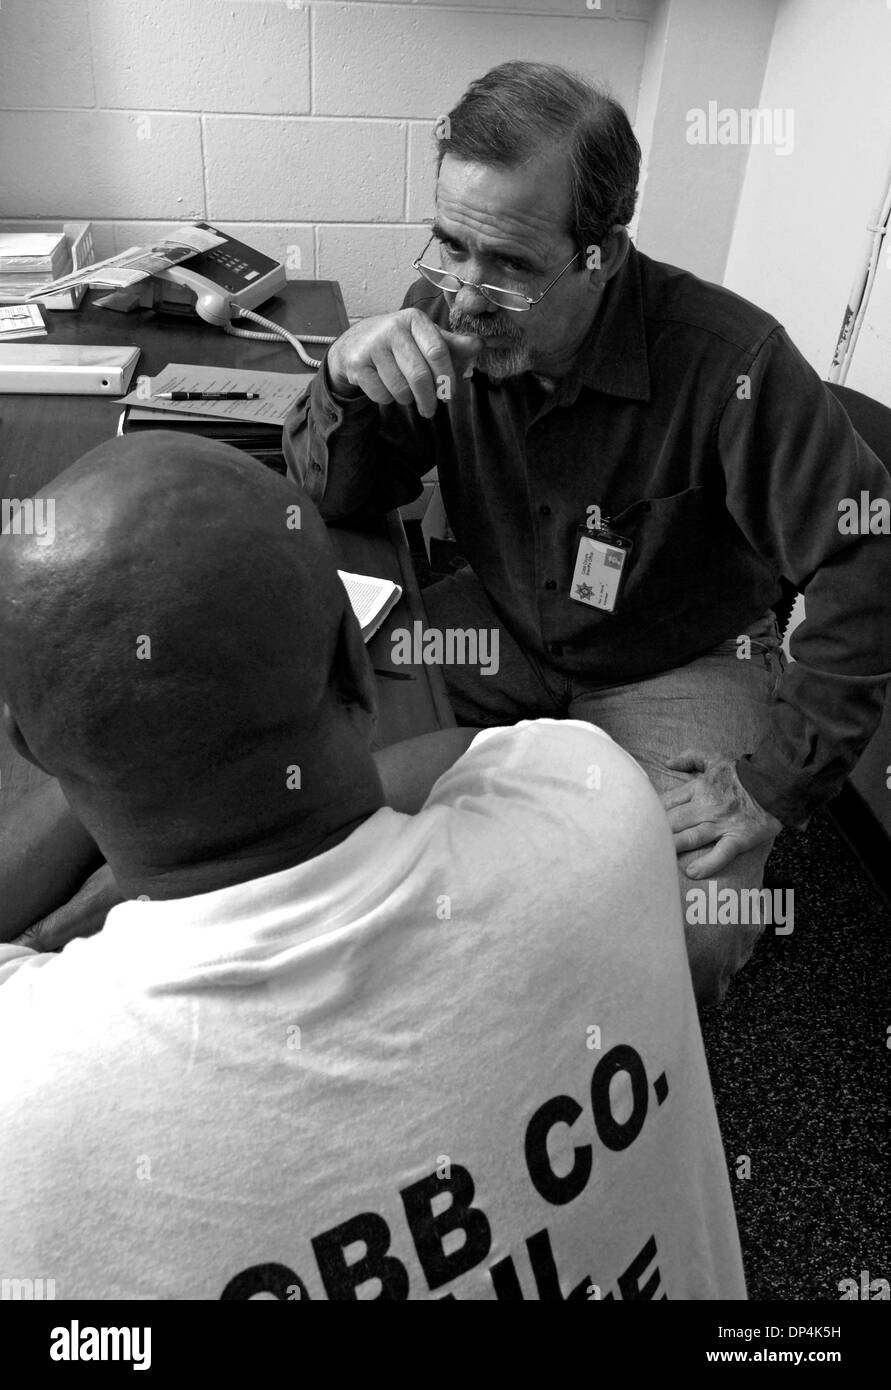 Prison Chaplain Inmates Stock Photos & Prison Chaplain